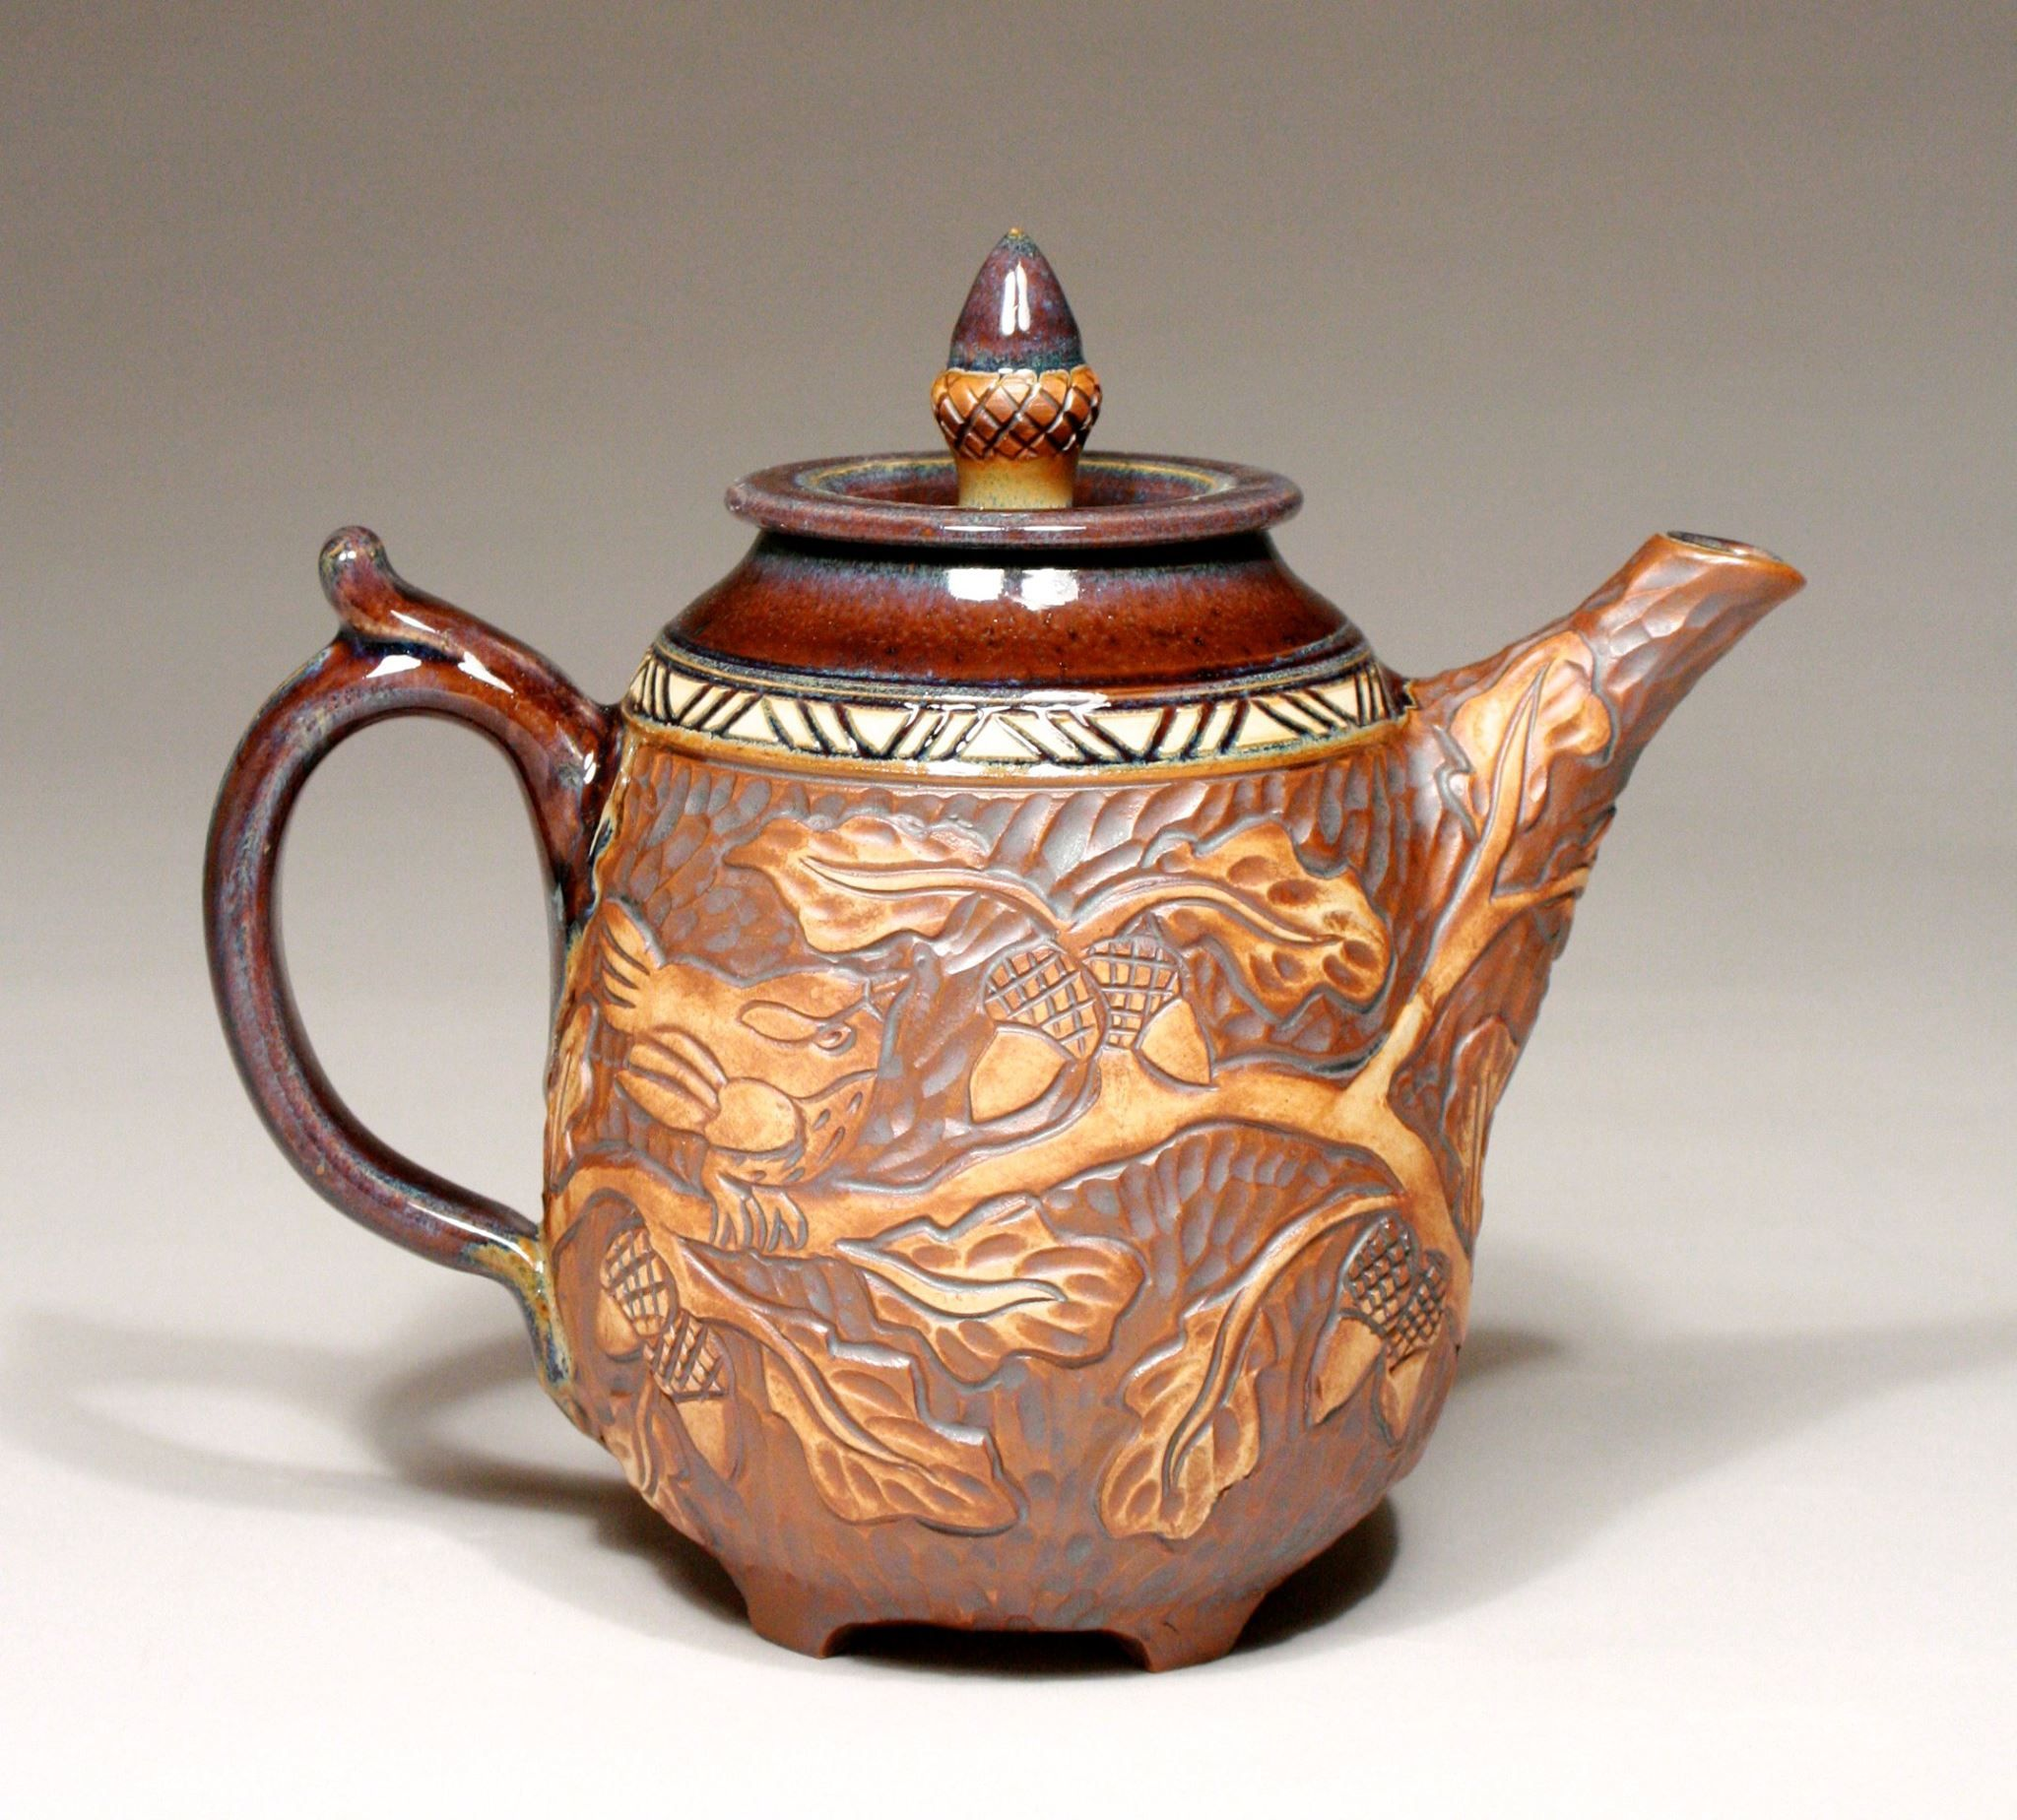 Foxlo Pottery | Fox and Lois Garney | Tea Pot | Amphora Gallery | Cambria, California